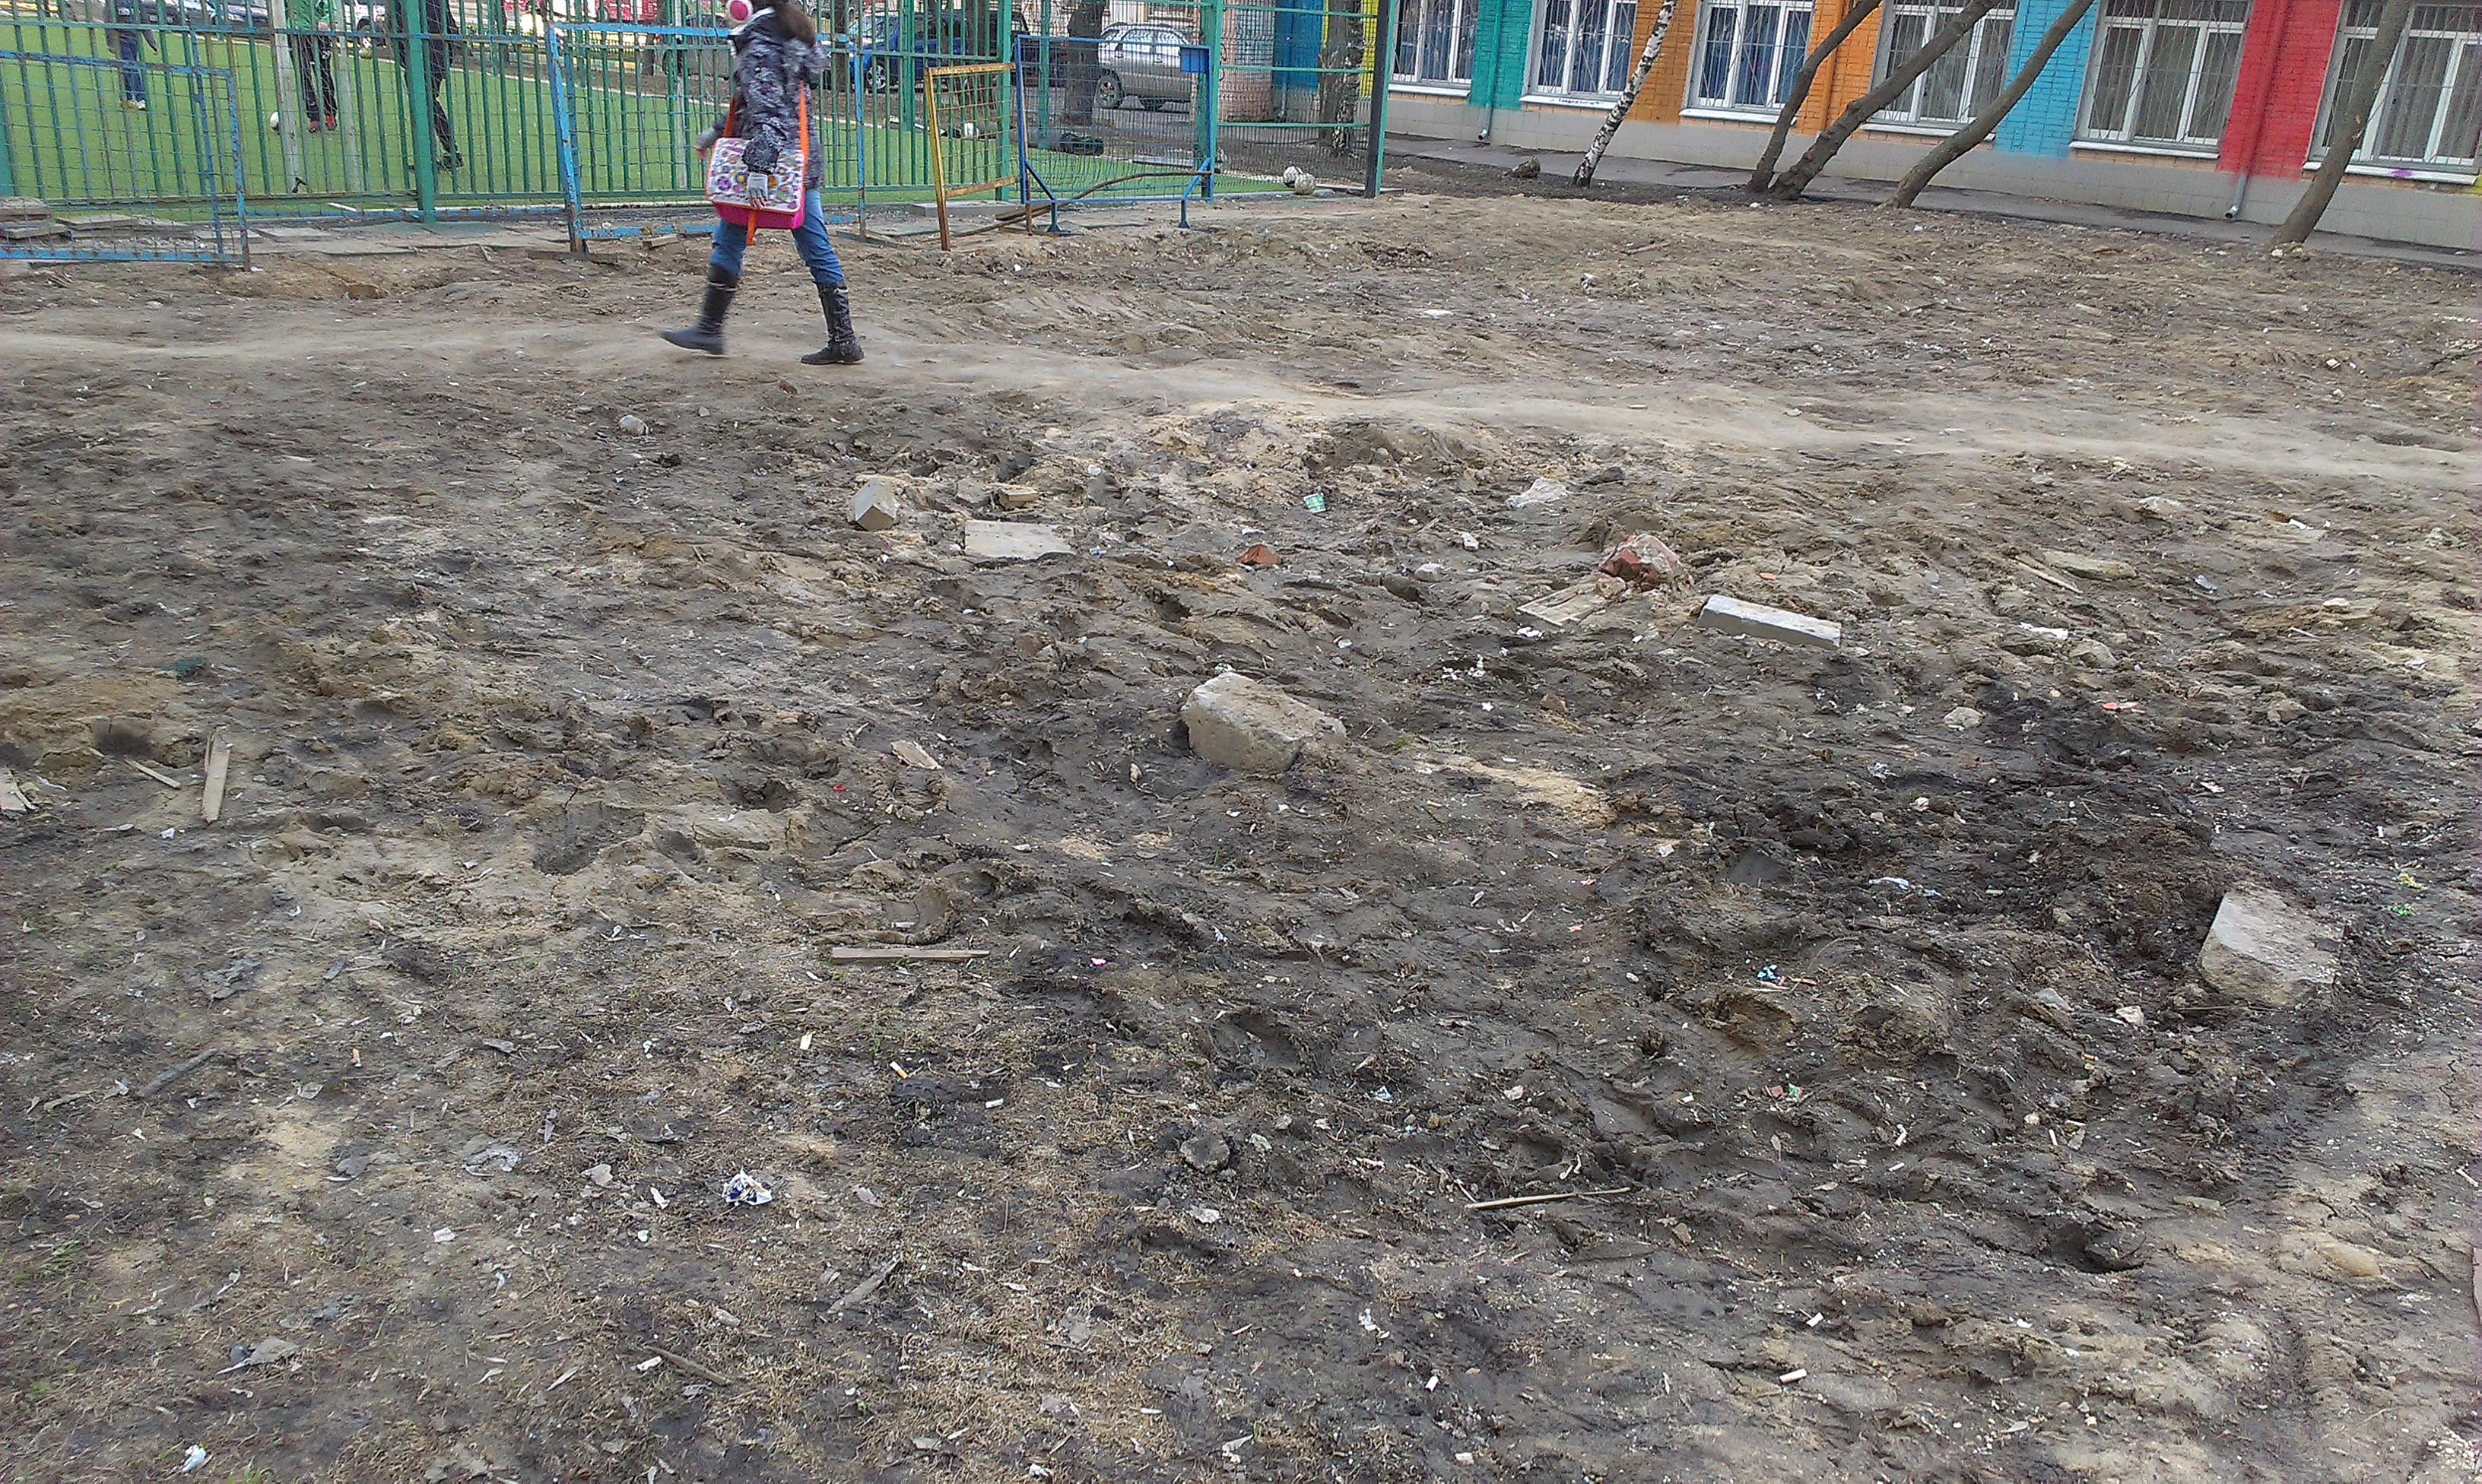 64569ad7664e Архивы фото телефон 2016 - Бутырский хутор